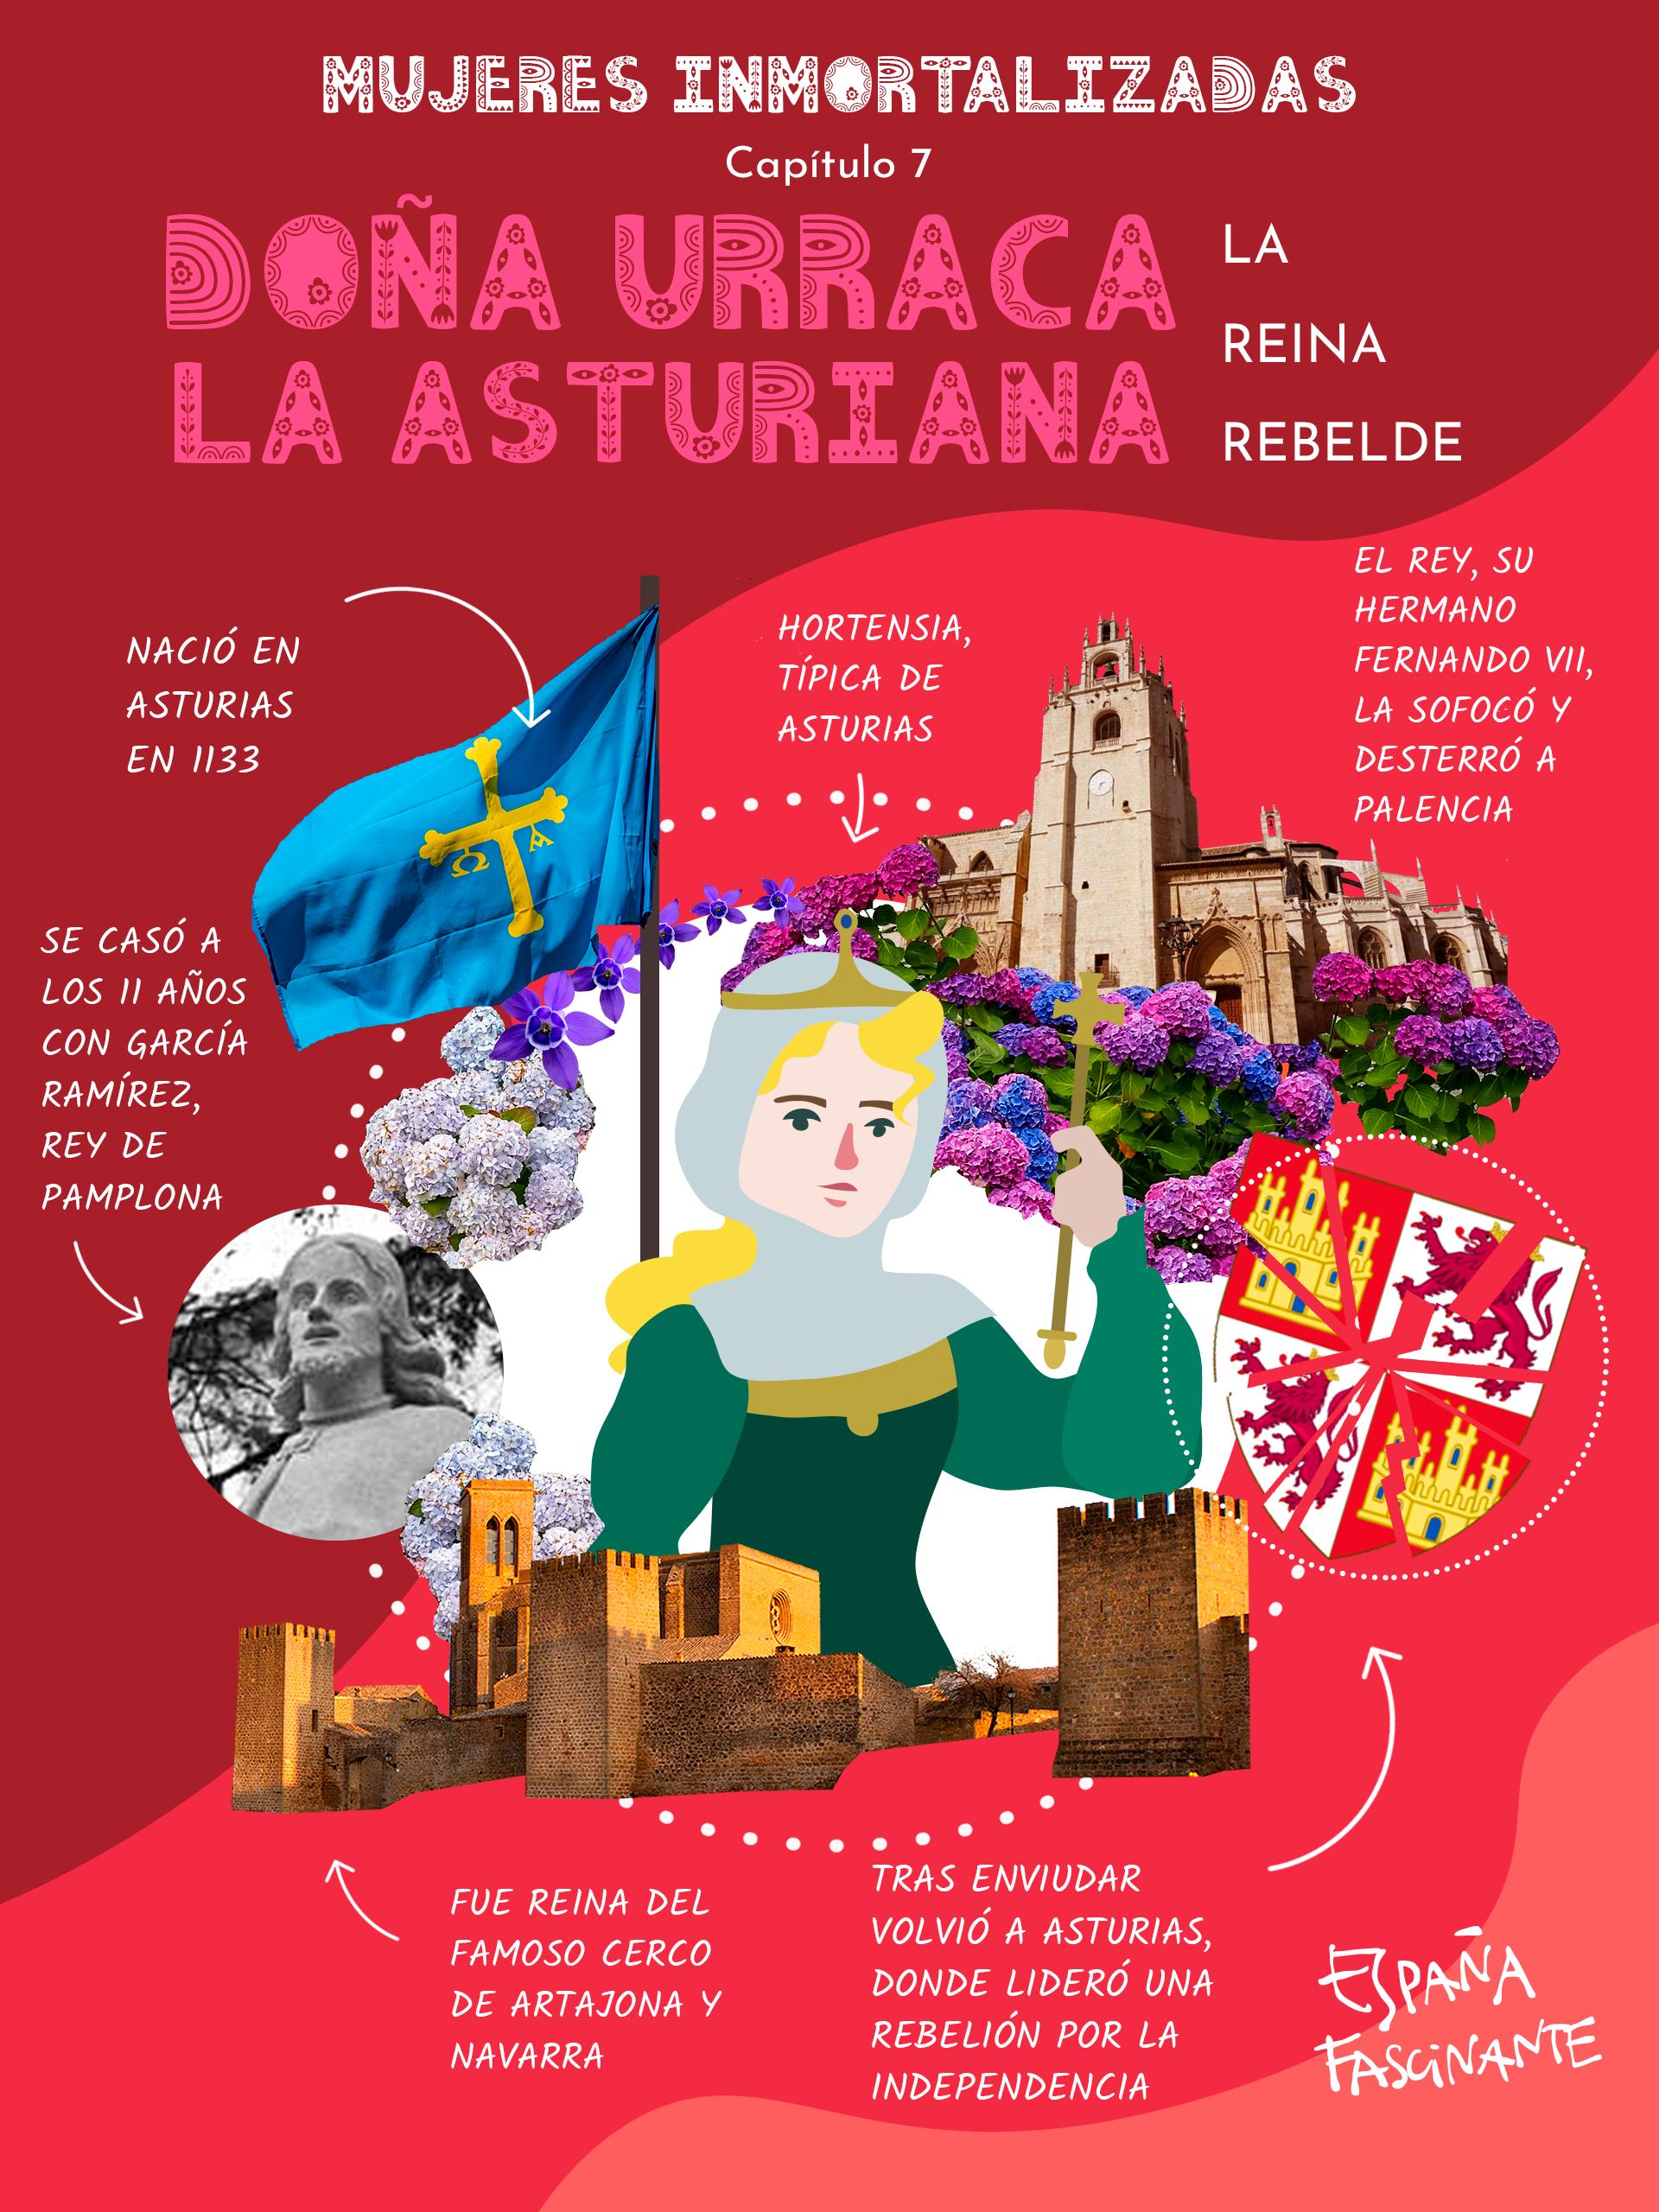 Doña Urraca la asturiana